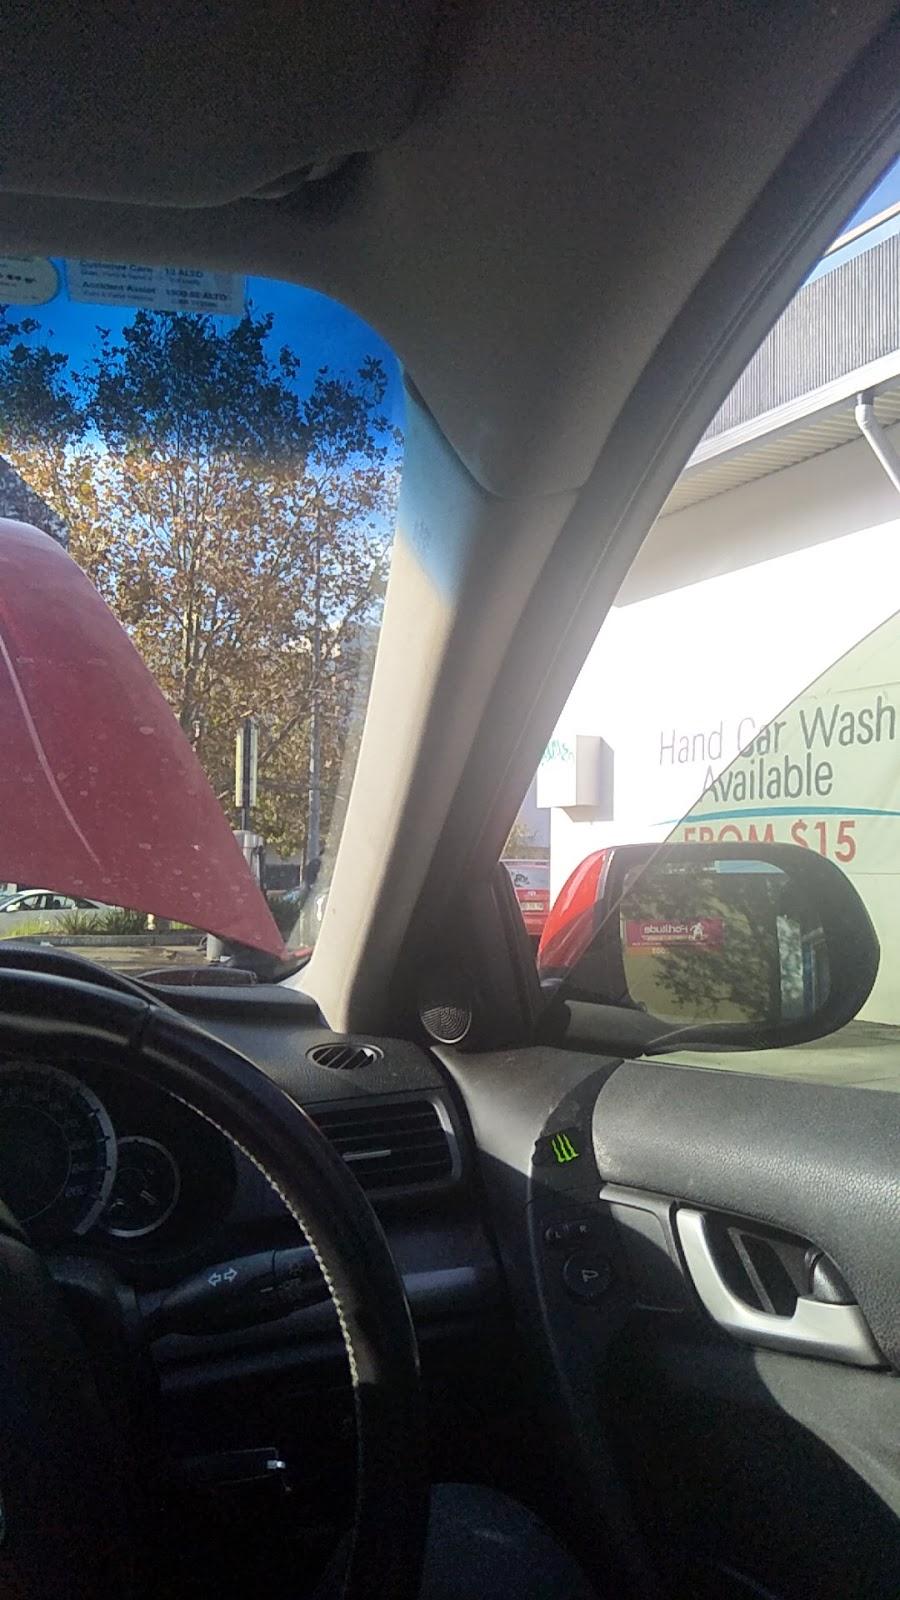 Pristine Carwash | car wash | 52-54 McFarlane St, Merrylands NSW 2160, Australia | 0410644786 OR +61 410 644 786